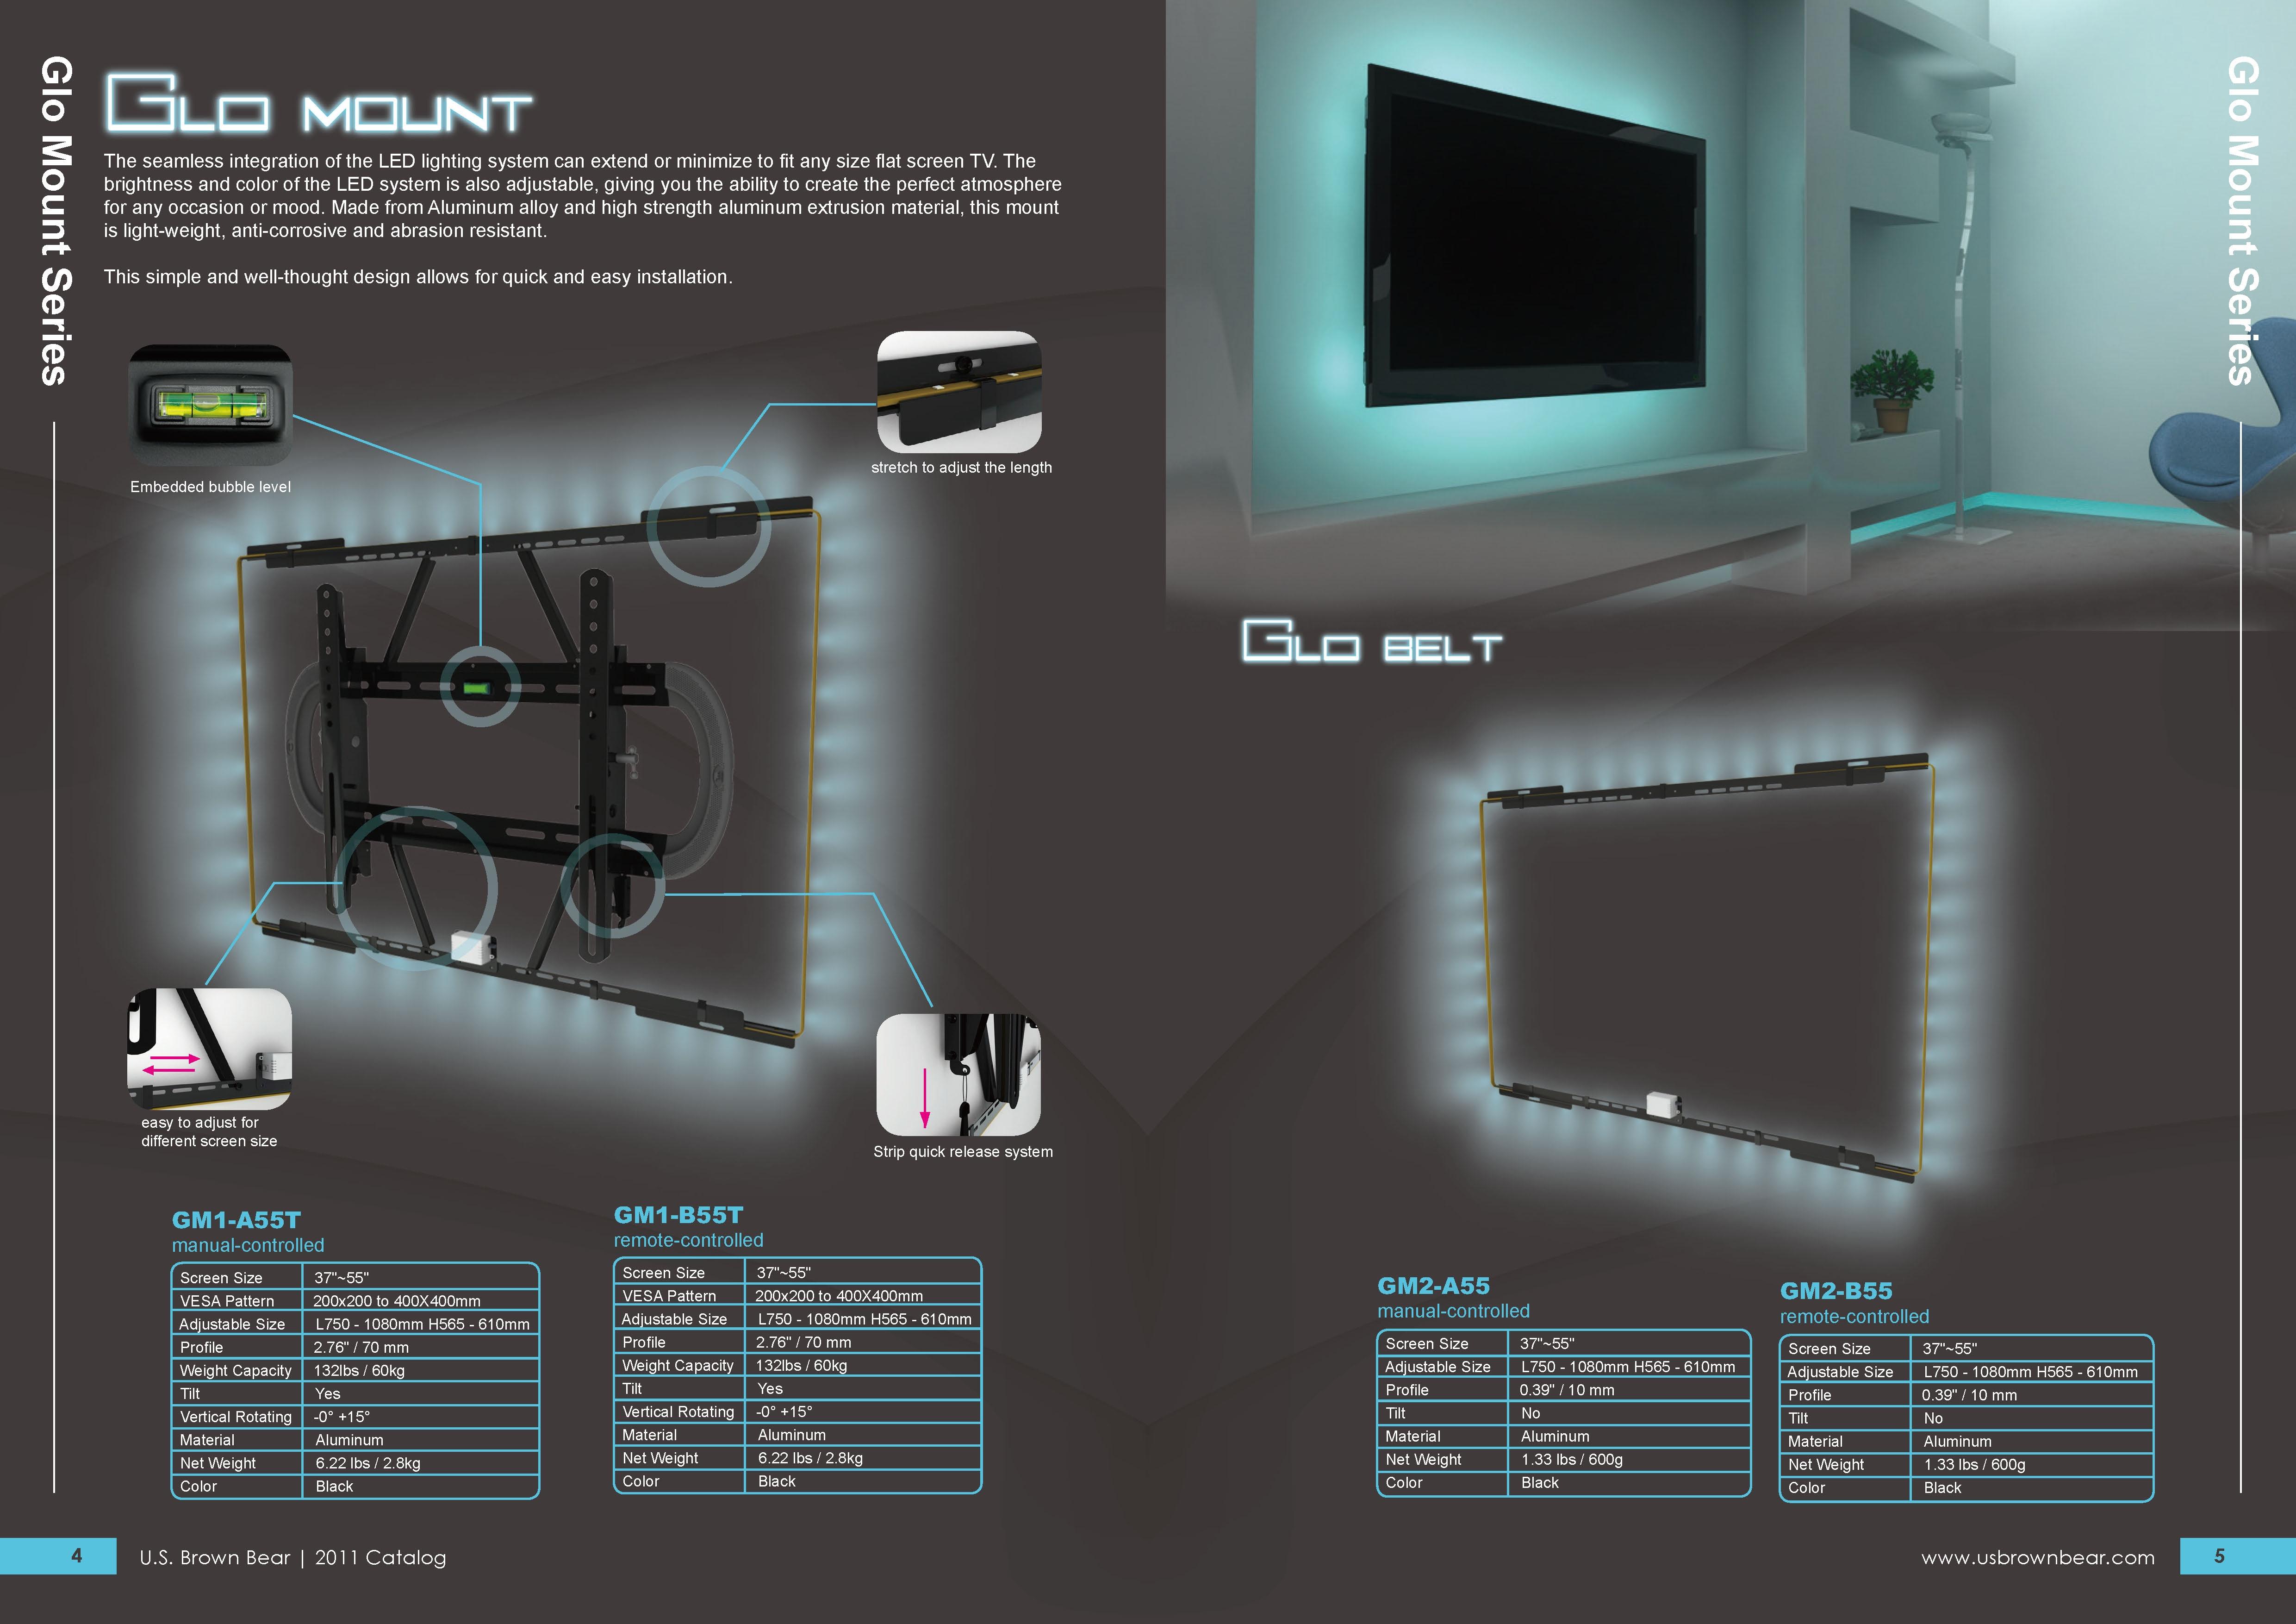 Taiwan Glo Mount - LED Lighting Mount for Flat Screen TV